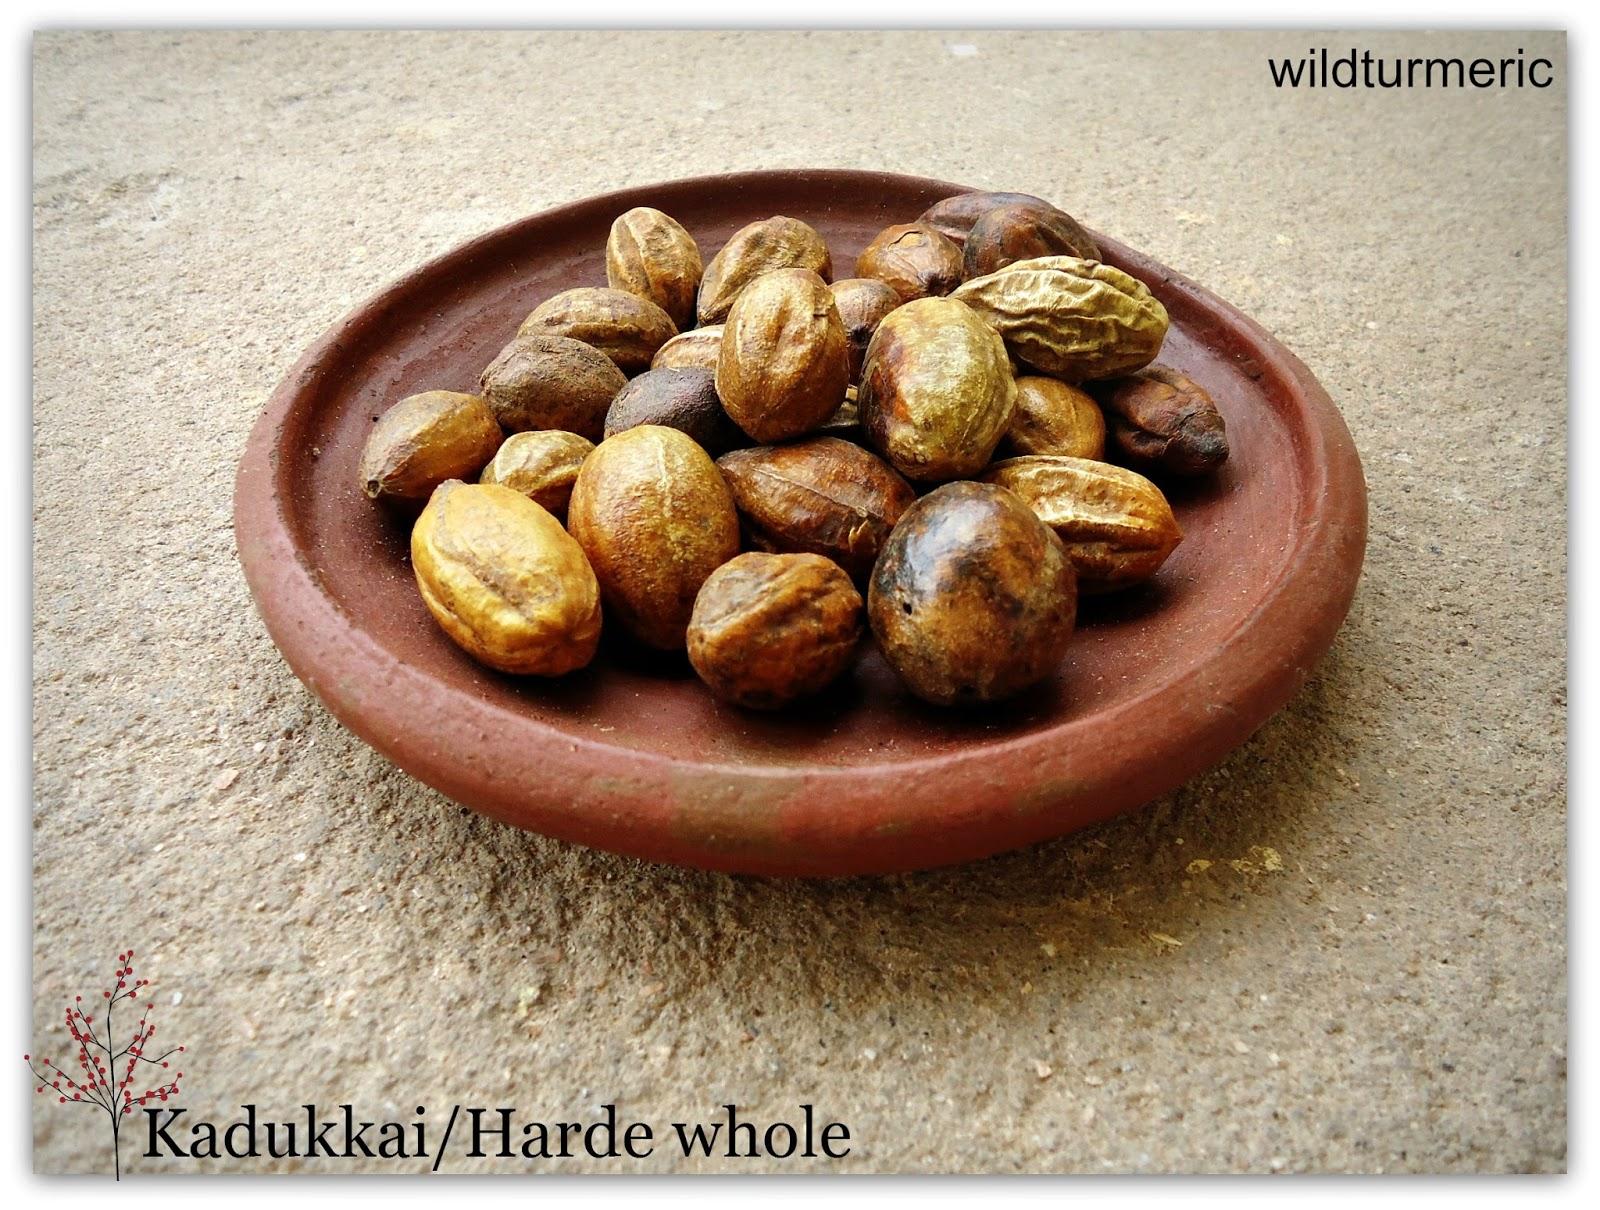 how to use kadukkai powder for constipation